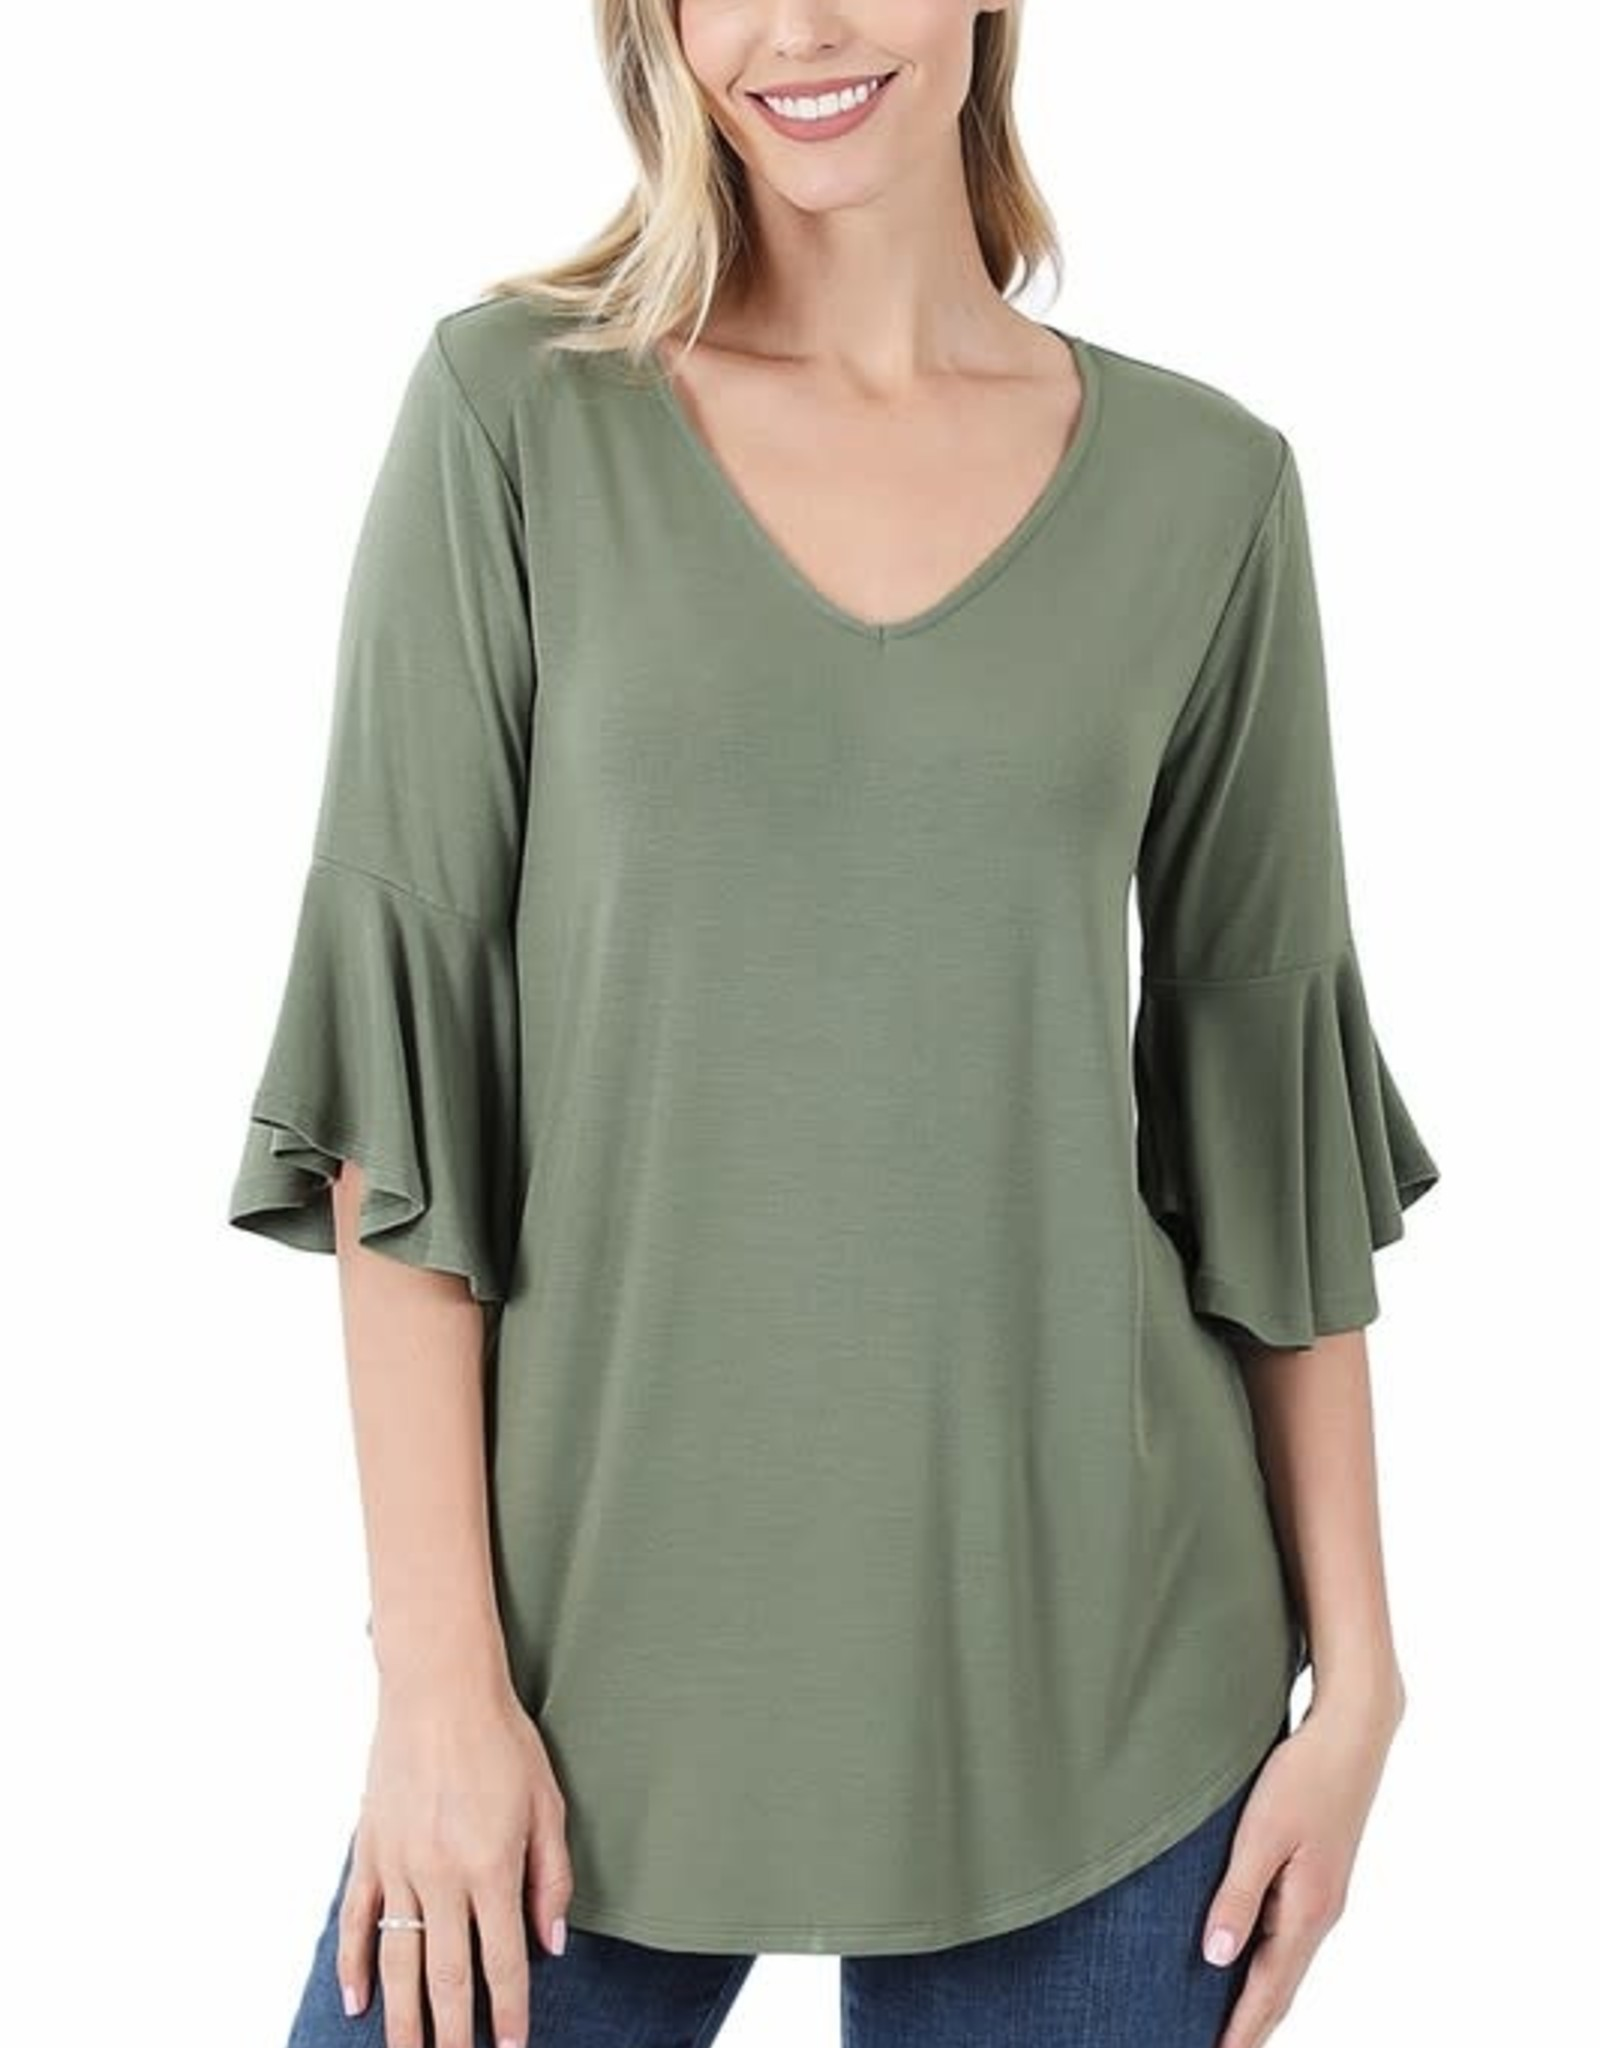 - Light Olive Waterfall Sleeve Top